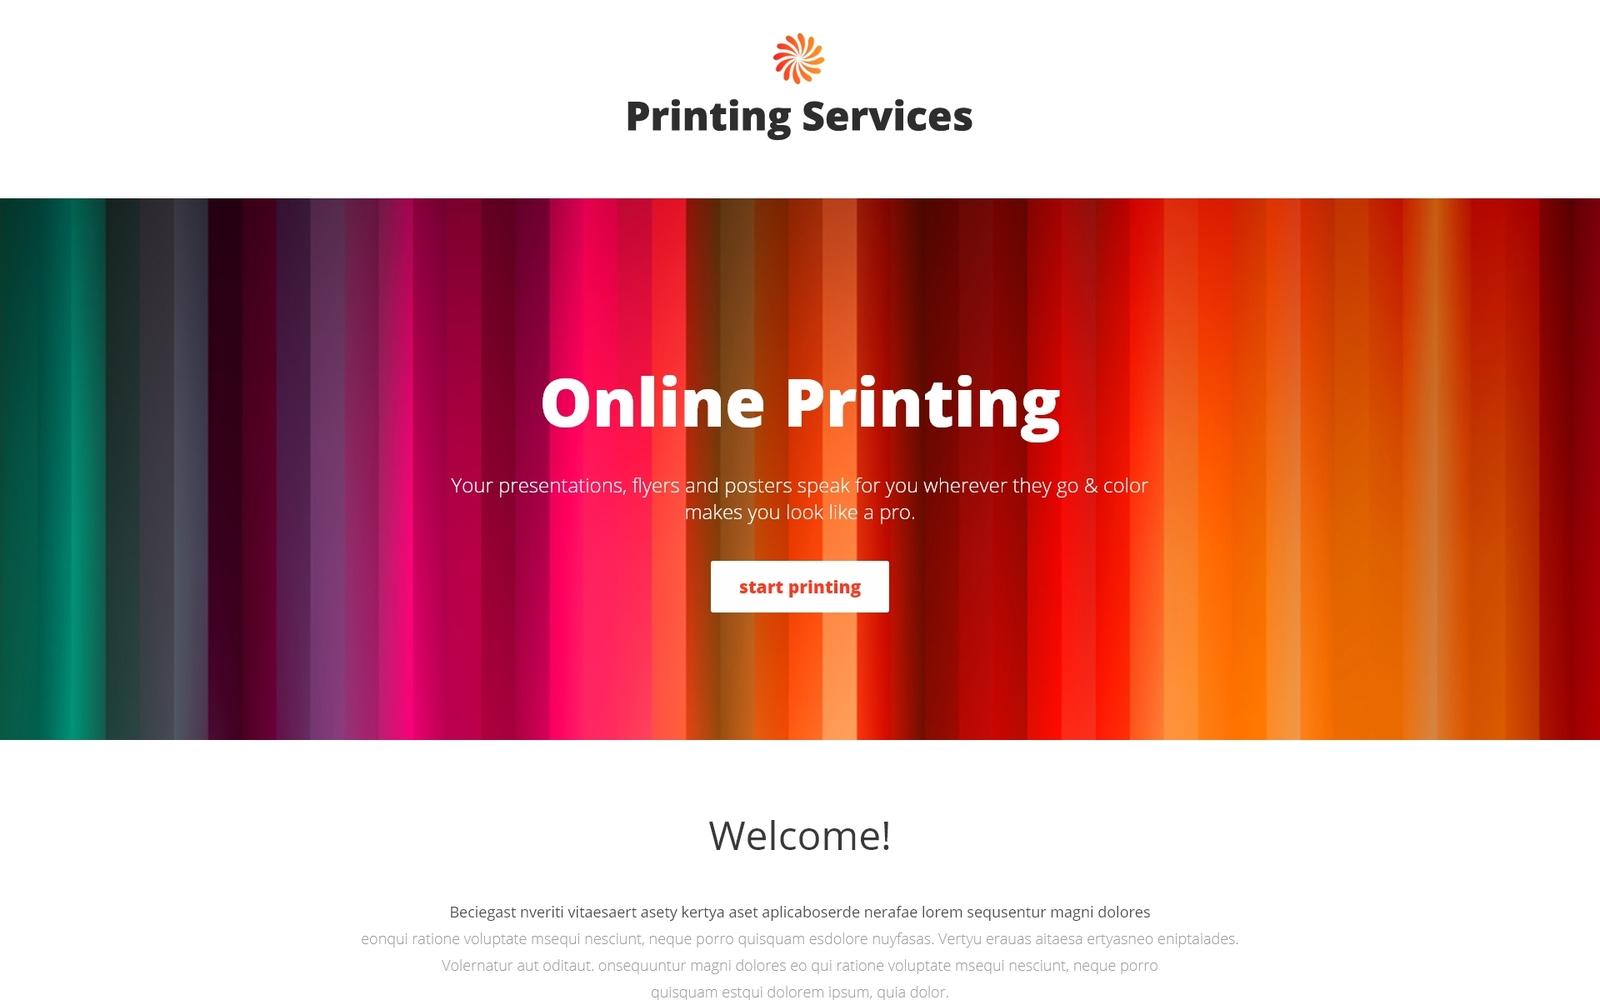 """Printing Services - Online Printing with Novi Builder Landing Page Template"" Responsive Landingspagina Template №67261"